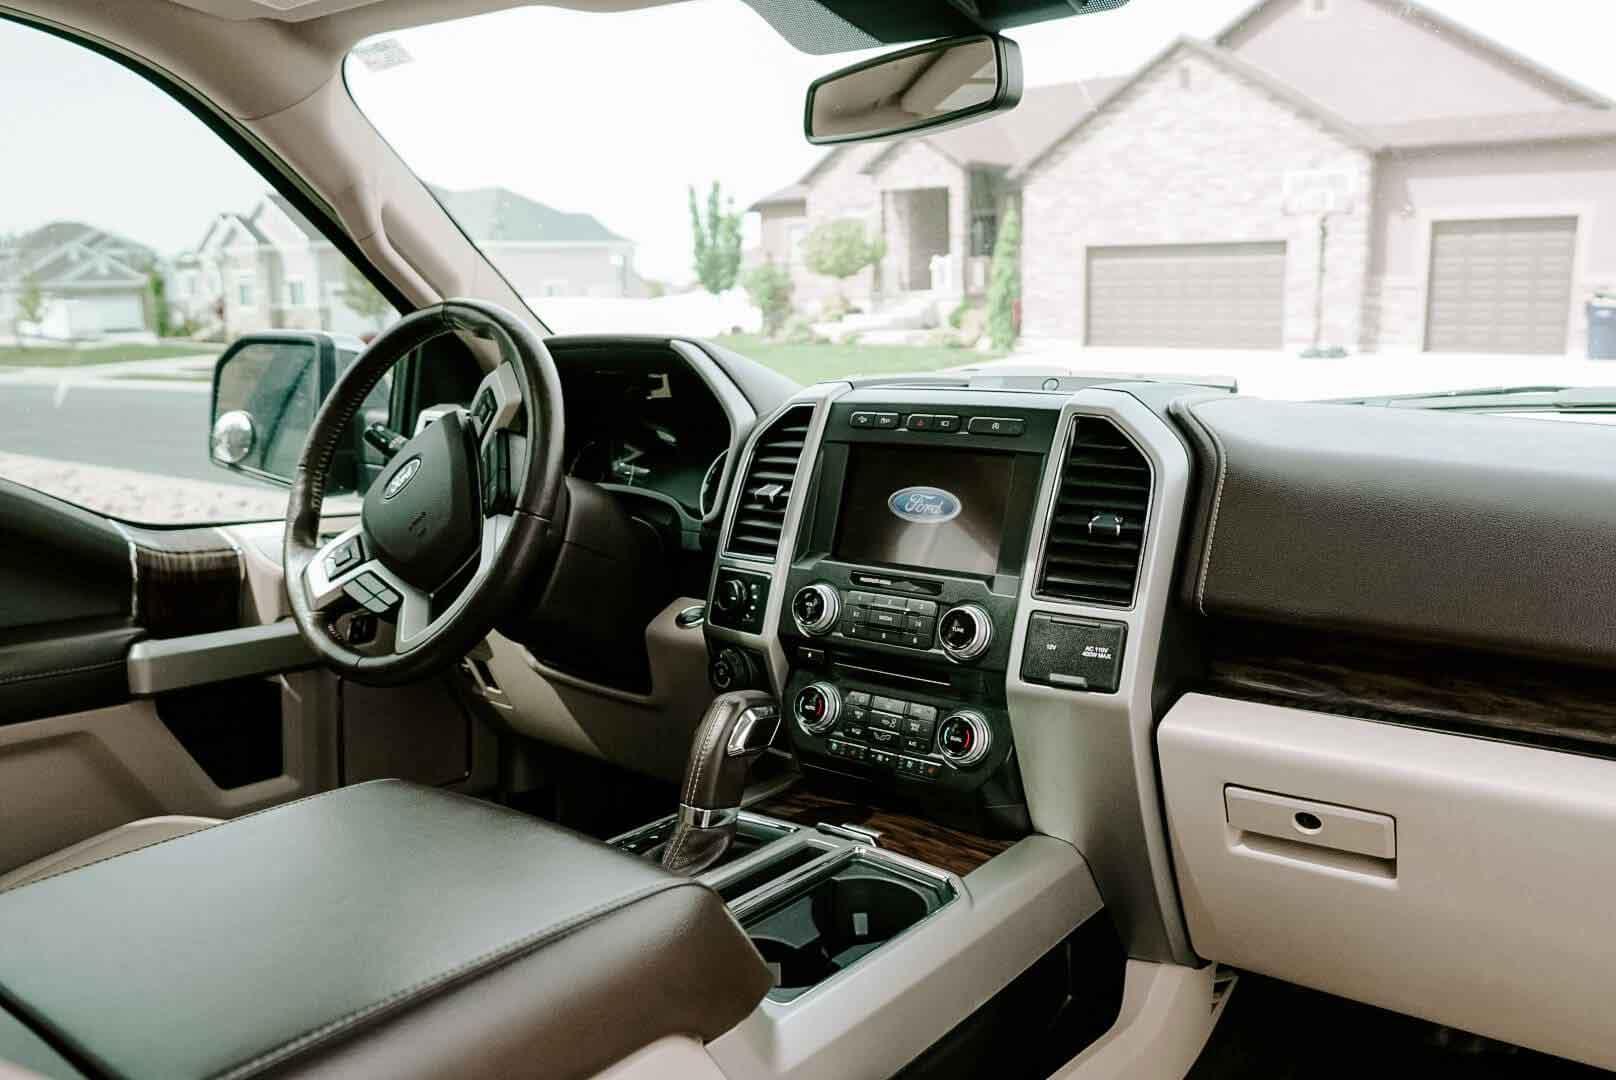 SUV interior after car detailing in Utah.